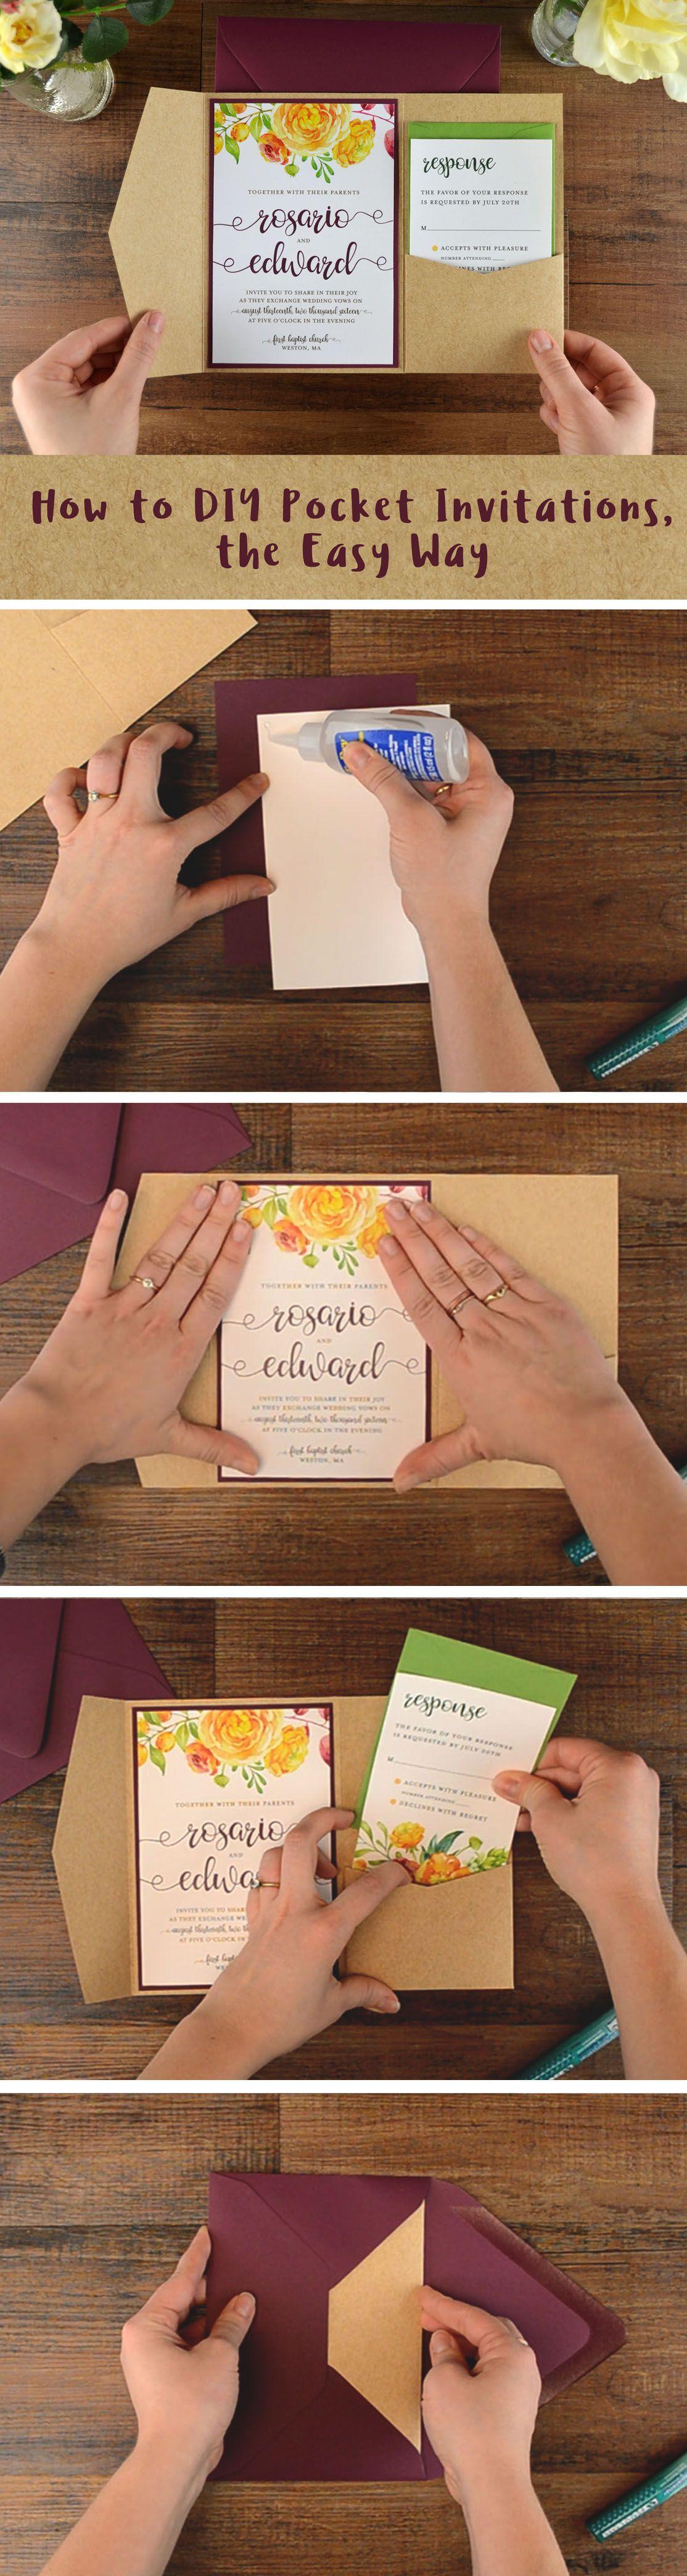 cheap wedding invites Easy DIY Pocket Invitation It s easy to create cheap wedding invitations when you DIY